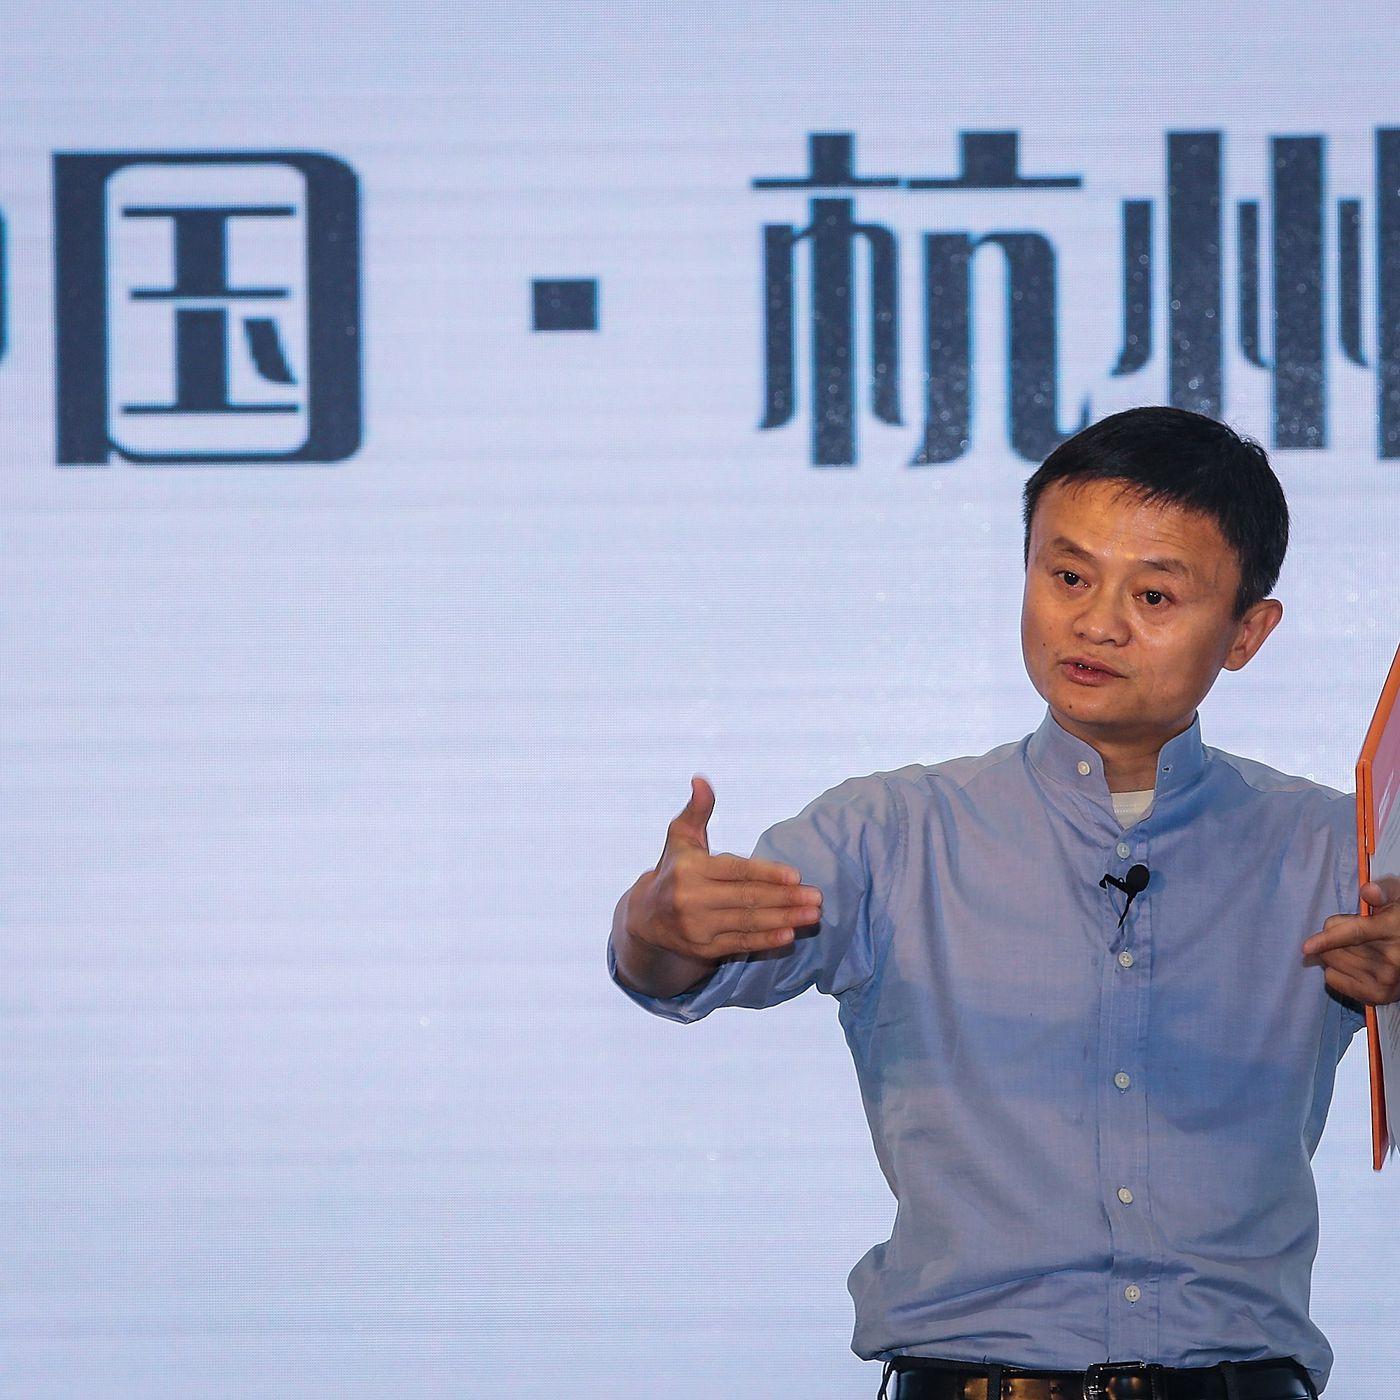 Alibaba Co Founder Jack Ma Is Planning Exit From The Company The Verge Página del grupo alibaba, aliexpress, alimama, alipay, fliggy, alibaba cloud, alibaba international, alitelecom, dingtalk, juhuasuan, taobao marketplace, tmall, xiami, alios, 1688. alibaba co founder jack ma is planning